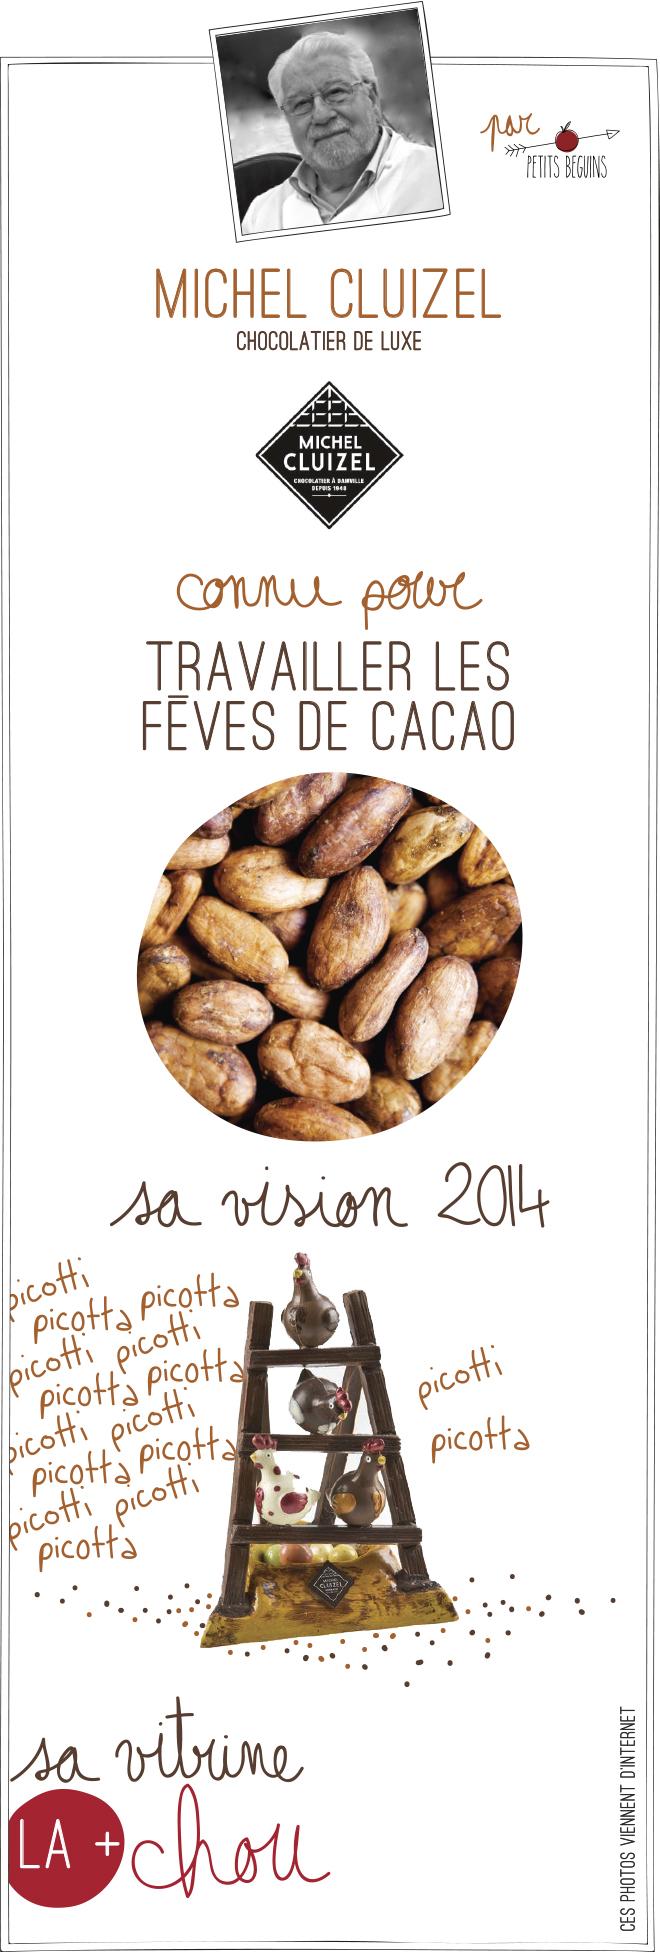 Michel Cluizel - Vitrine Pâques Chocolat - Petits Béguins